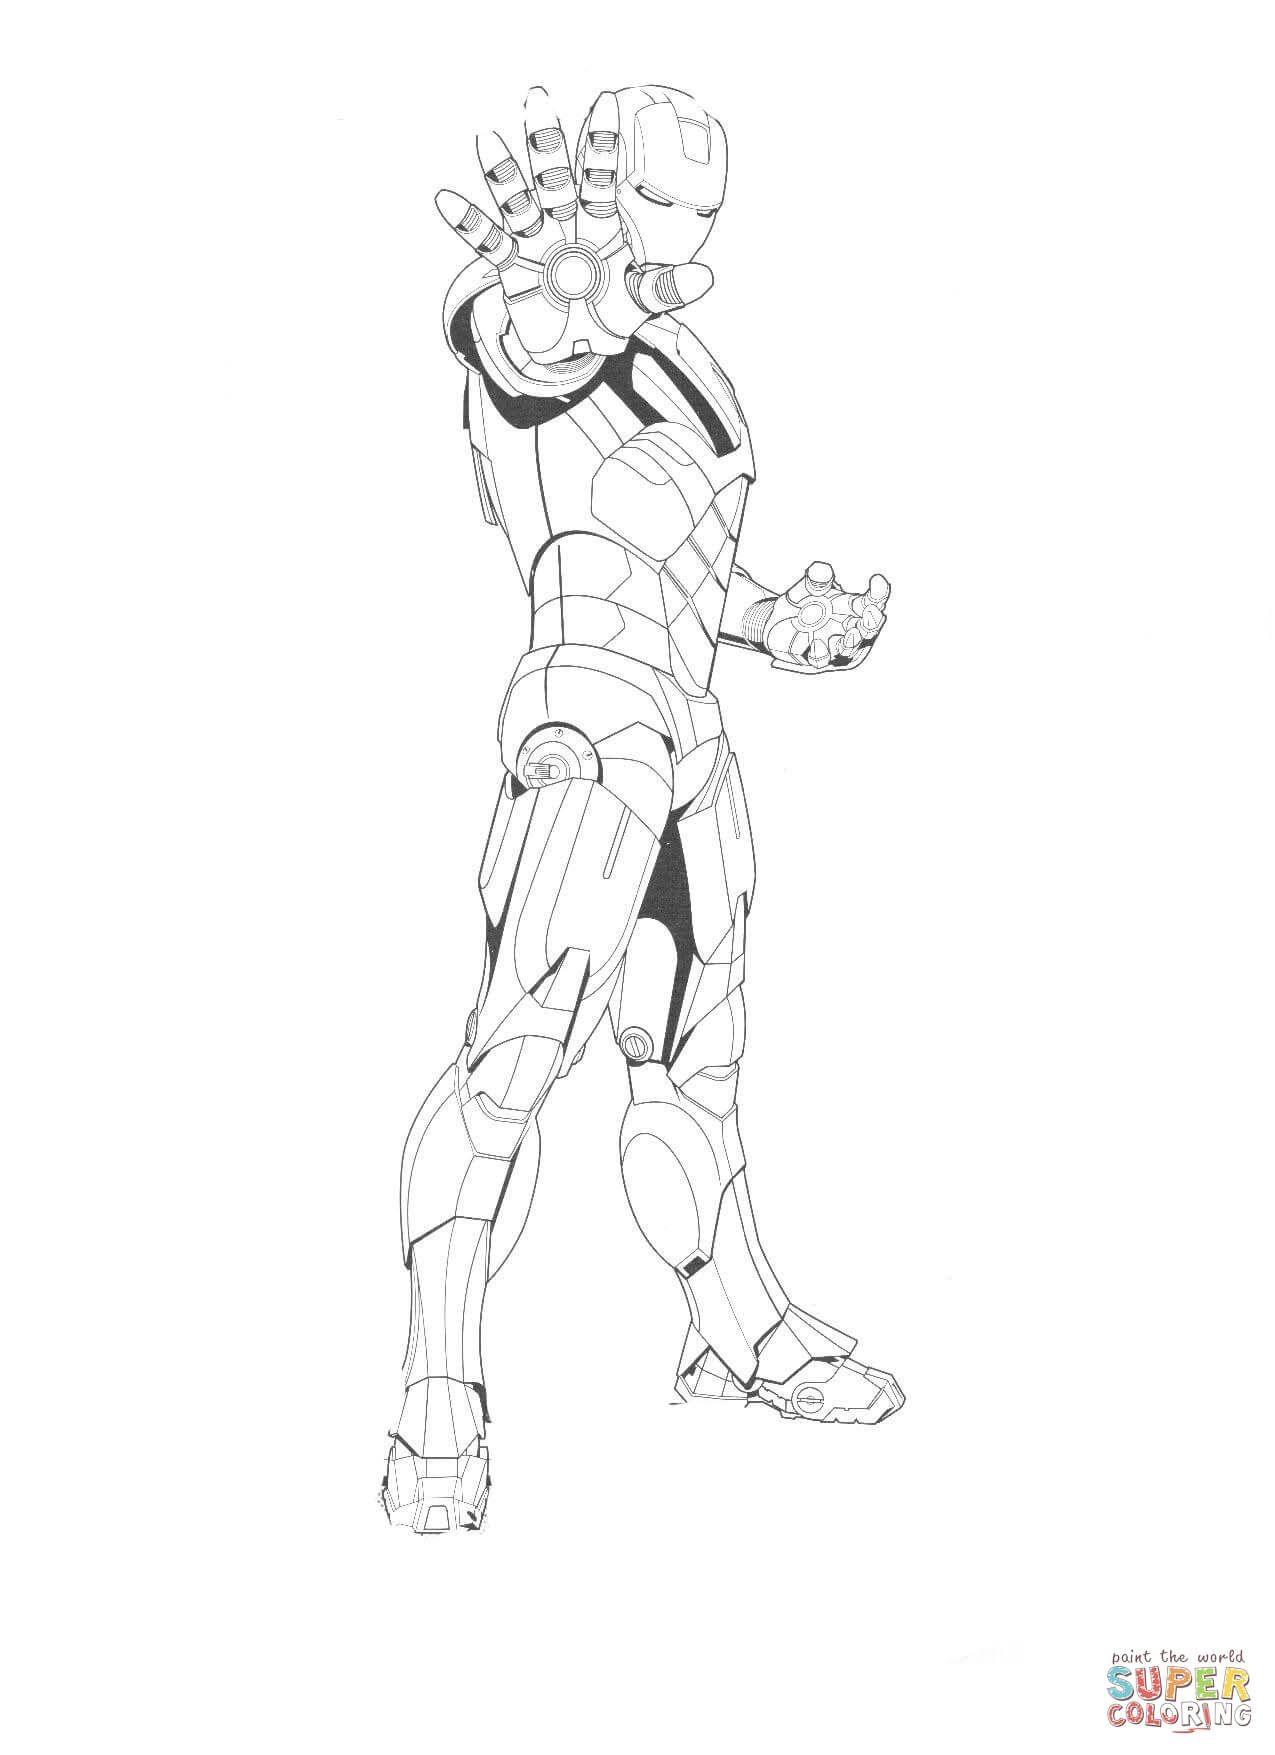 Iron Man Is Ready To Fight Super Coloring Iron Man Iron Man